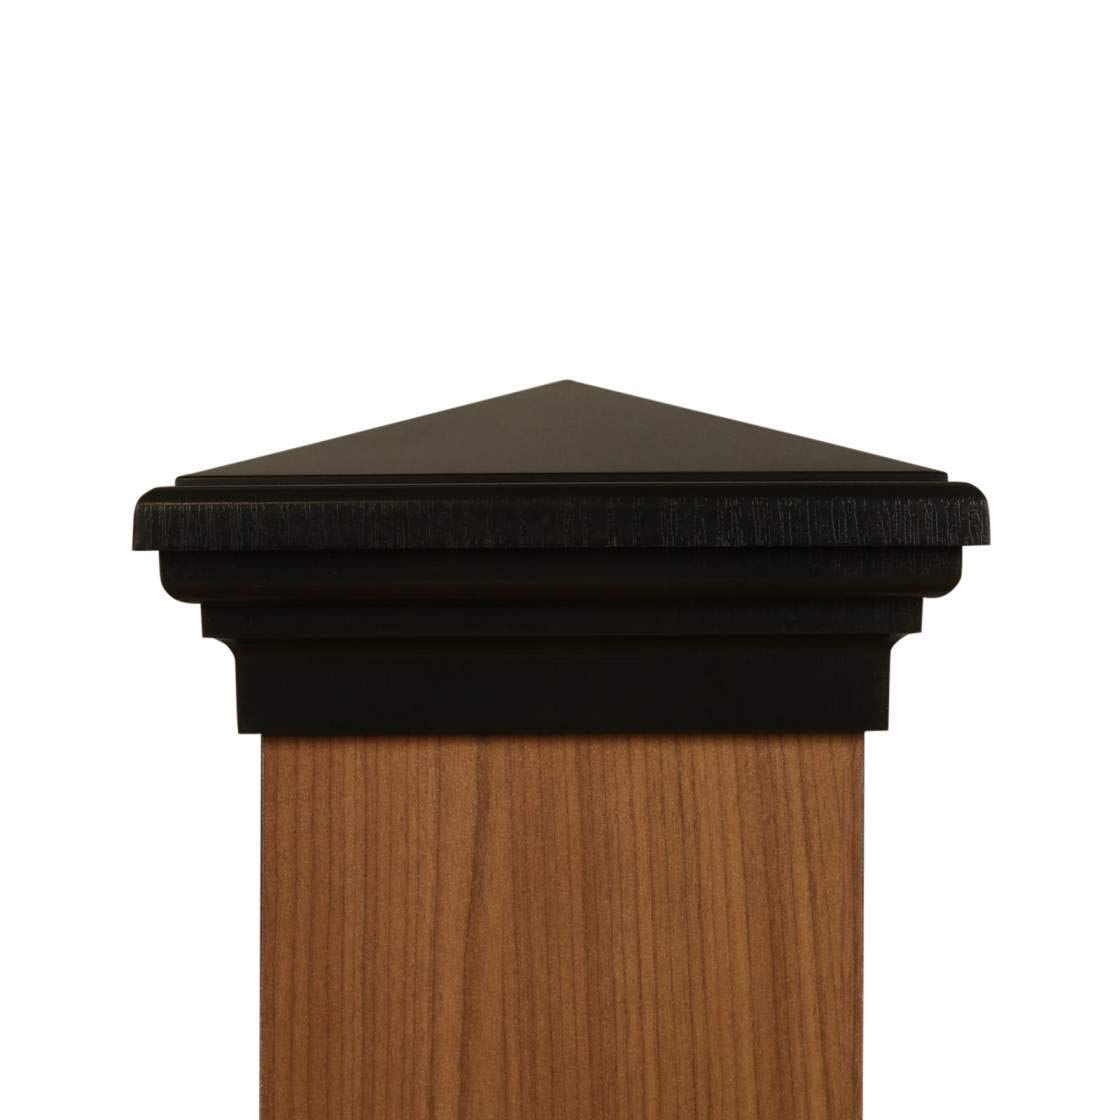 6x6 Post Cap (Nominal) - Black Pyramid Top (Case of 14) - With 10 Year Warranty by Atlanta Post Caps